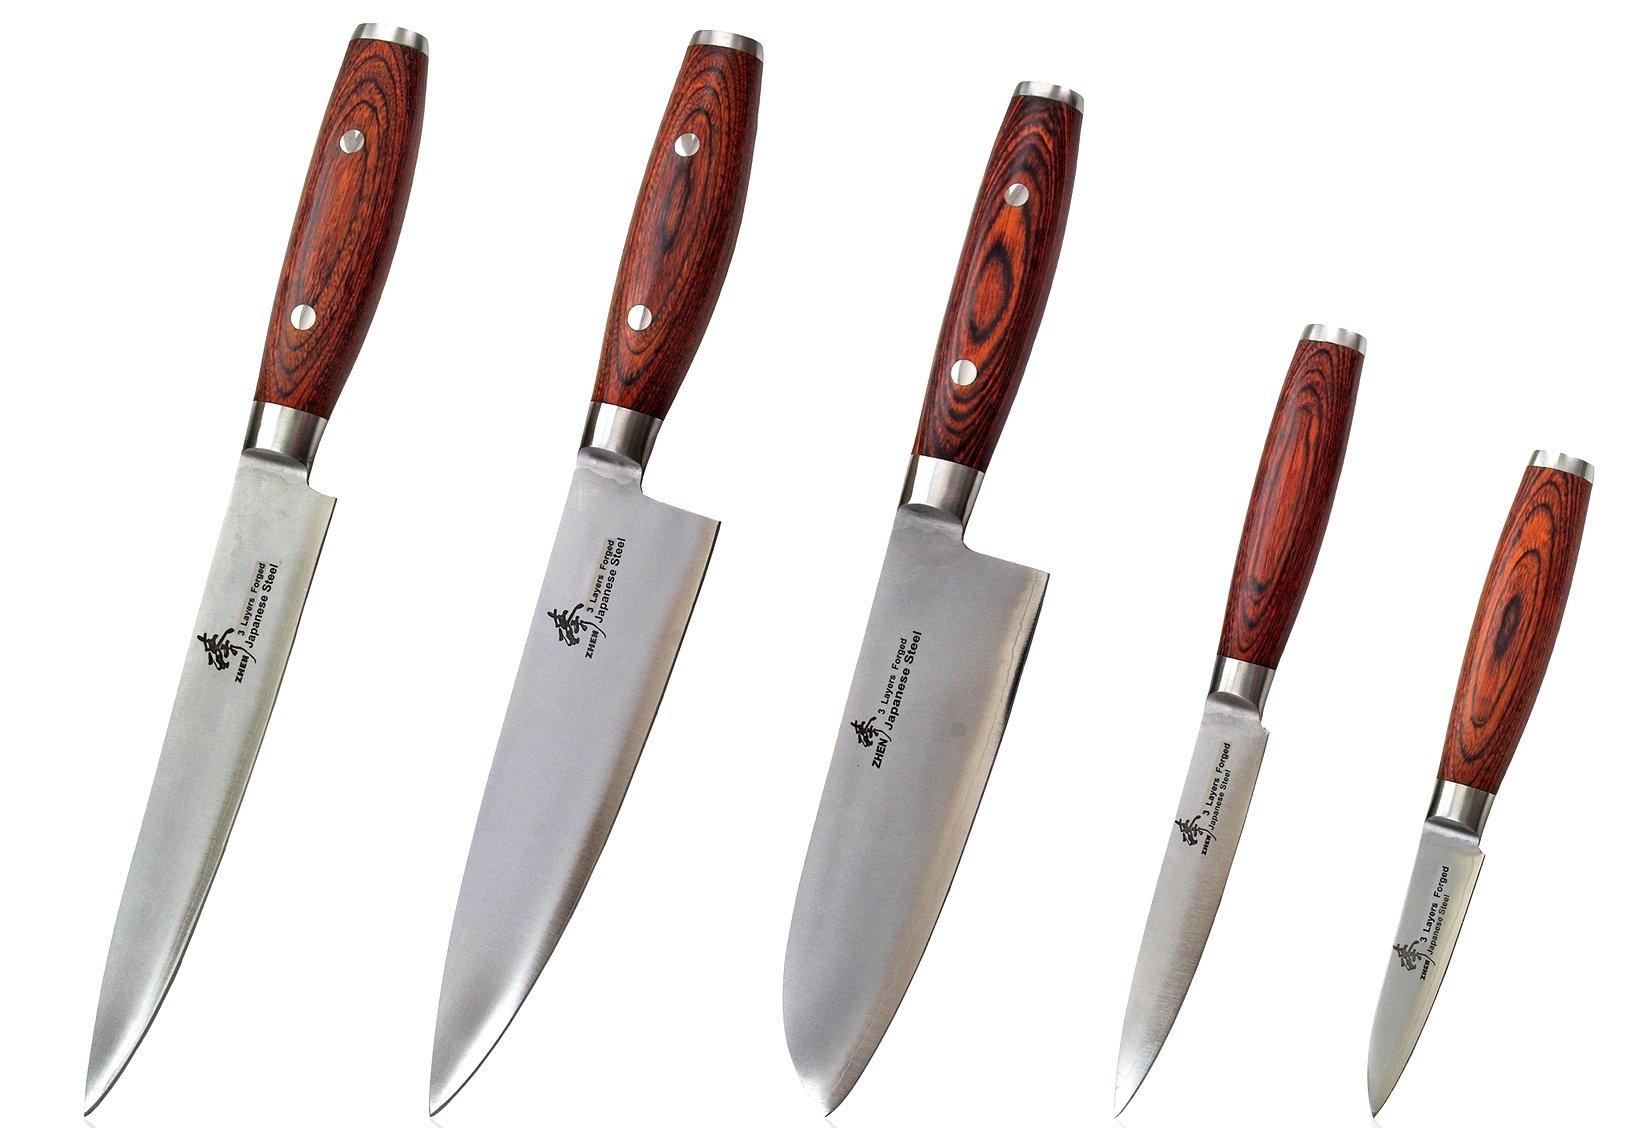 ZHEN Japanese VG-10 5-Piece 3-Layer Forged Steel Cutlery Knife Set, Pakka Wood